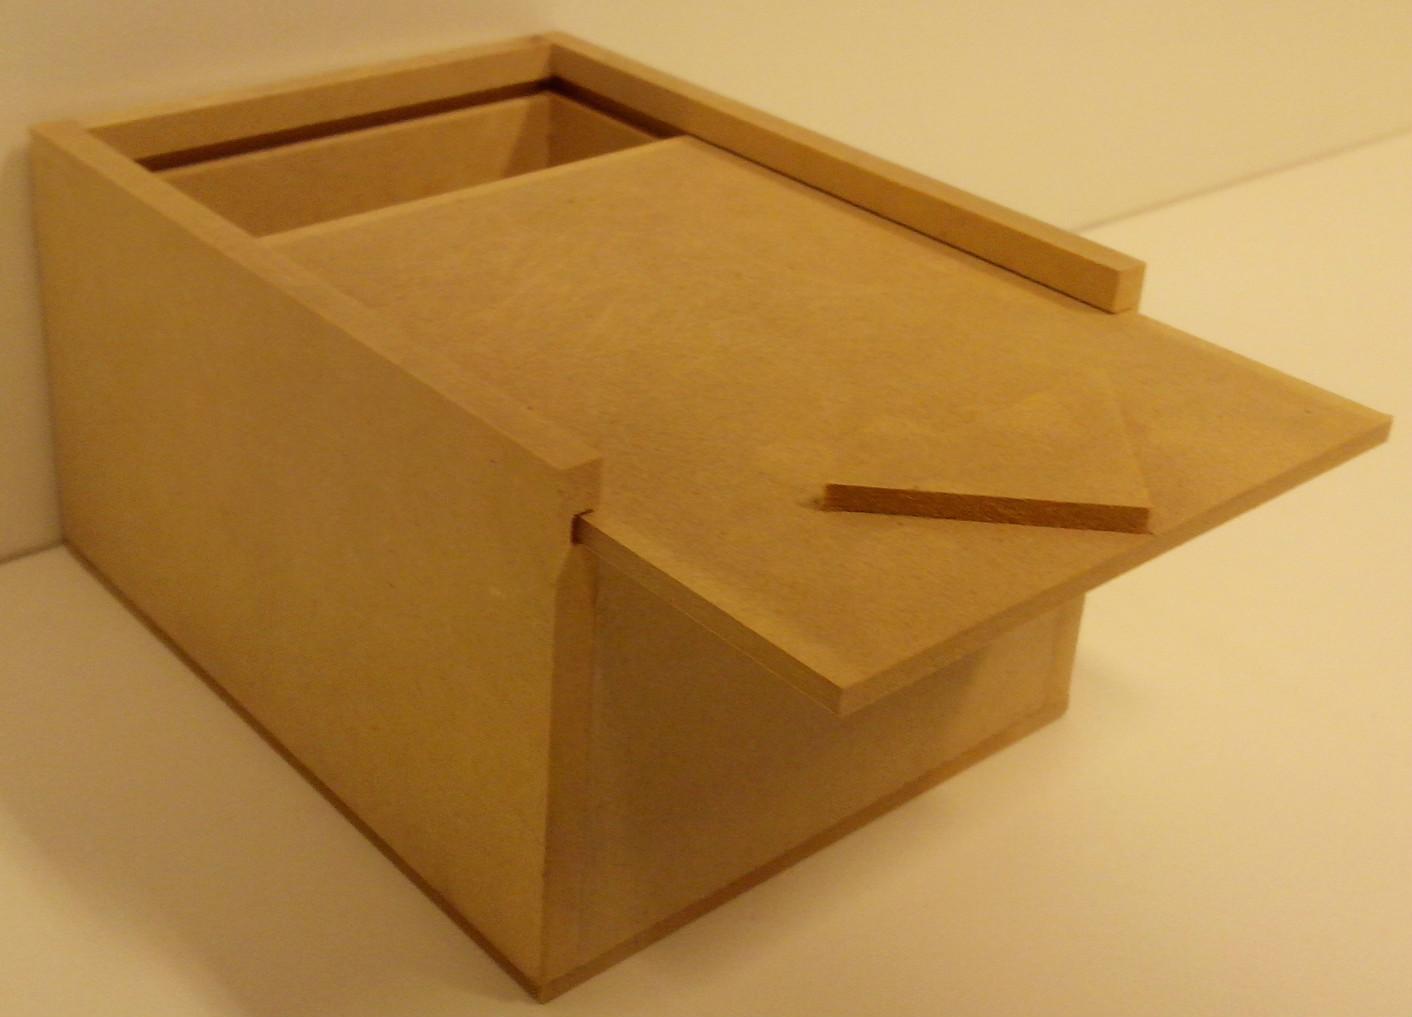 En cajas de madera cajas de madera como centro de mesa - Cajas de vino de madera decoradas ...